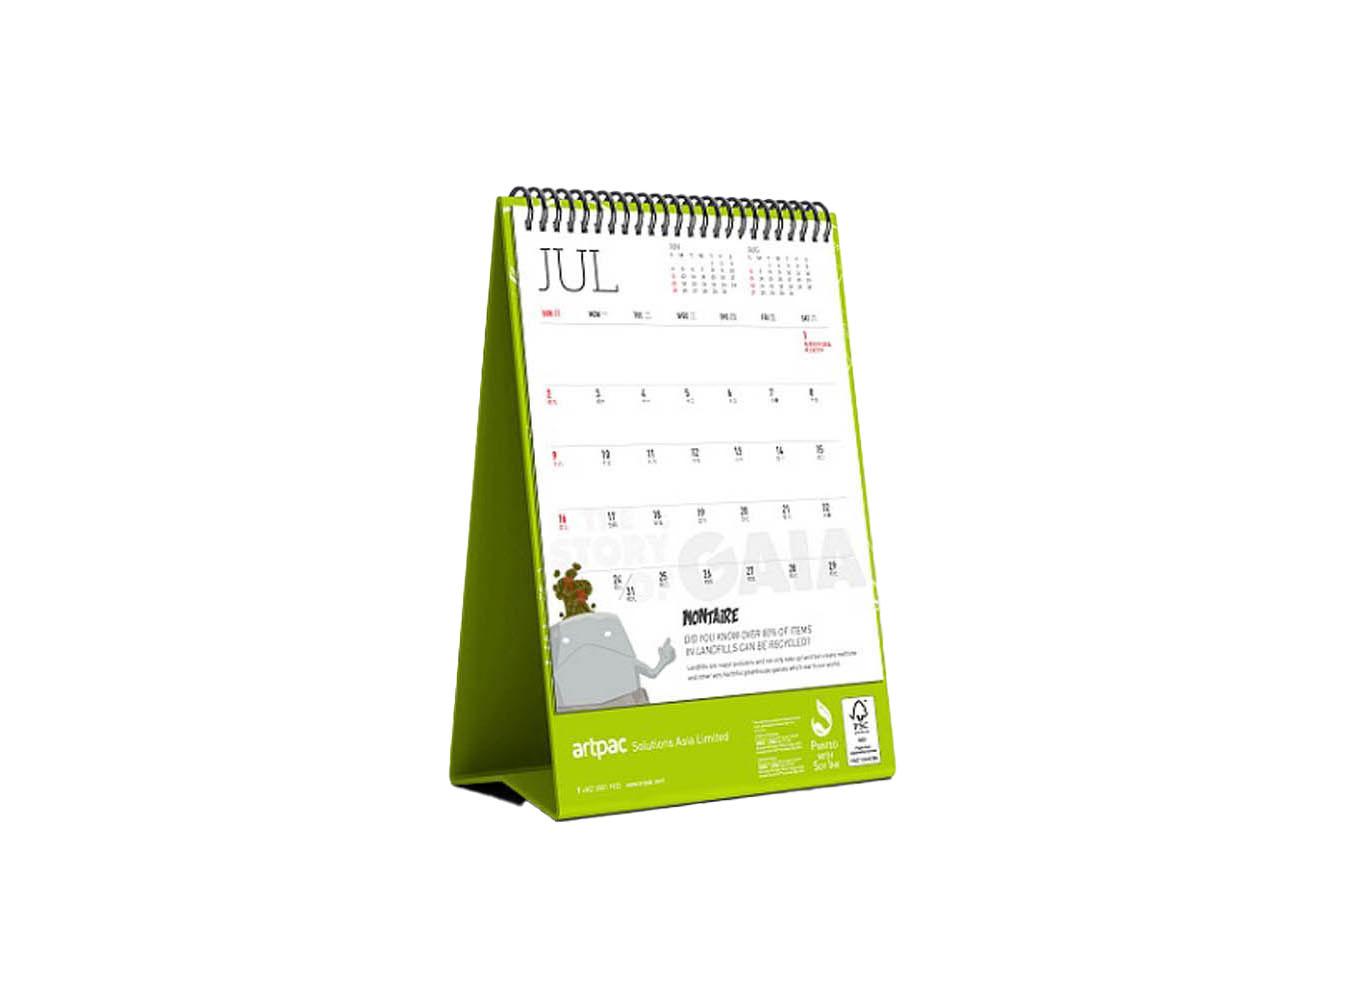 Custom Design Desk Calendar w/ Eco-Friendly Packaging